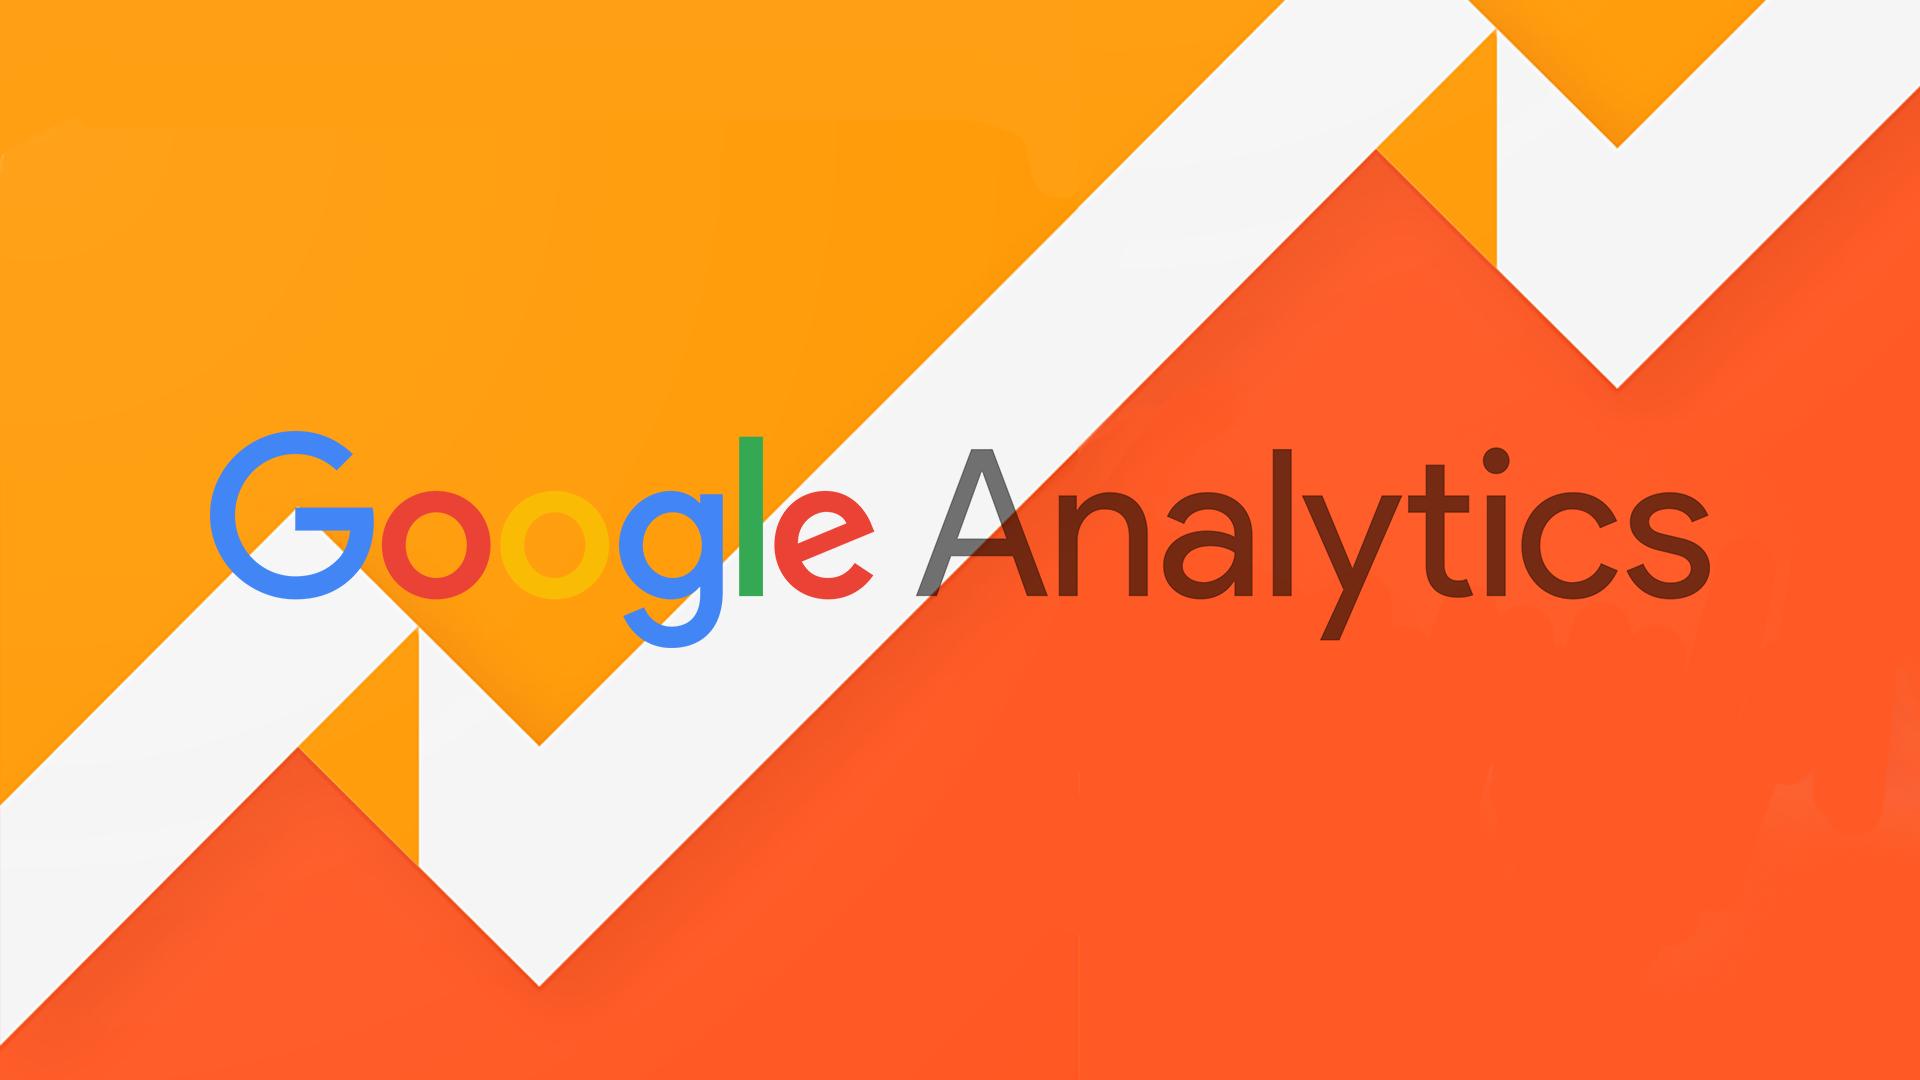 Bỏ qua Analytics